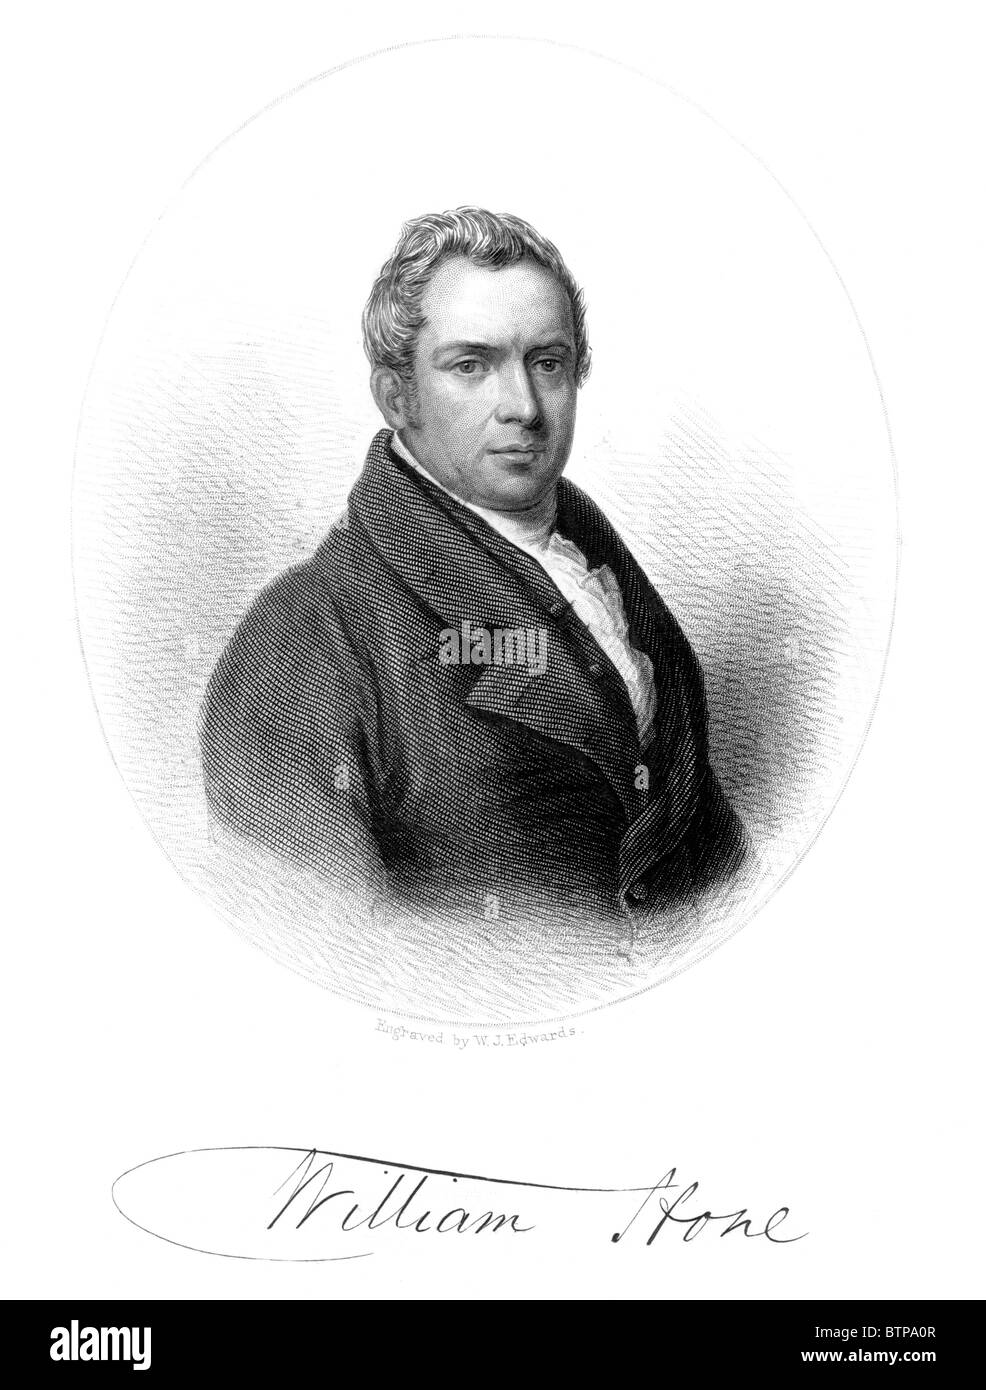 Portrait of William Hone, 19th century political satirist and writer; Black and White Illustration; Stock Photo